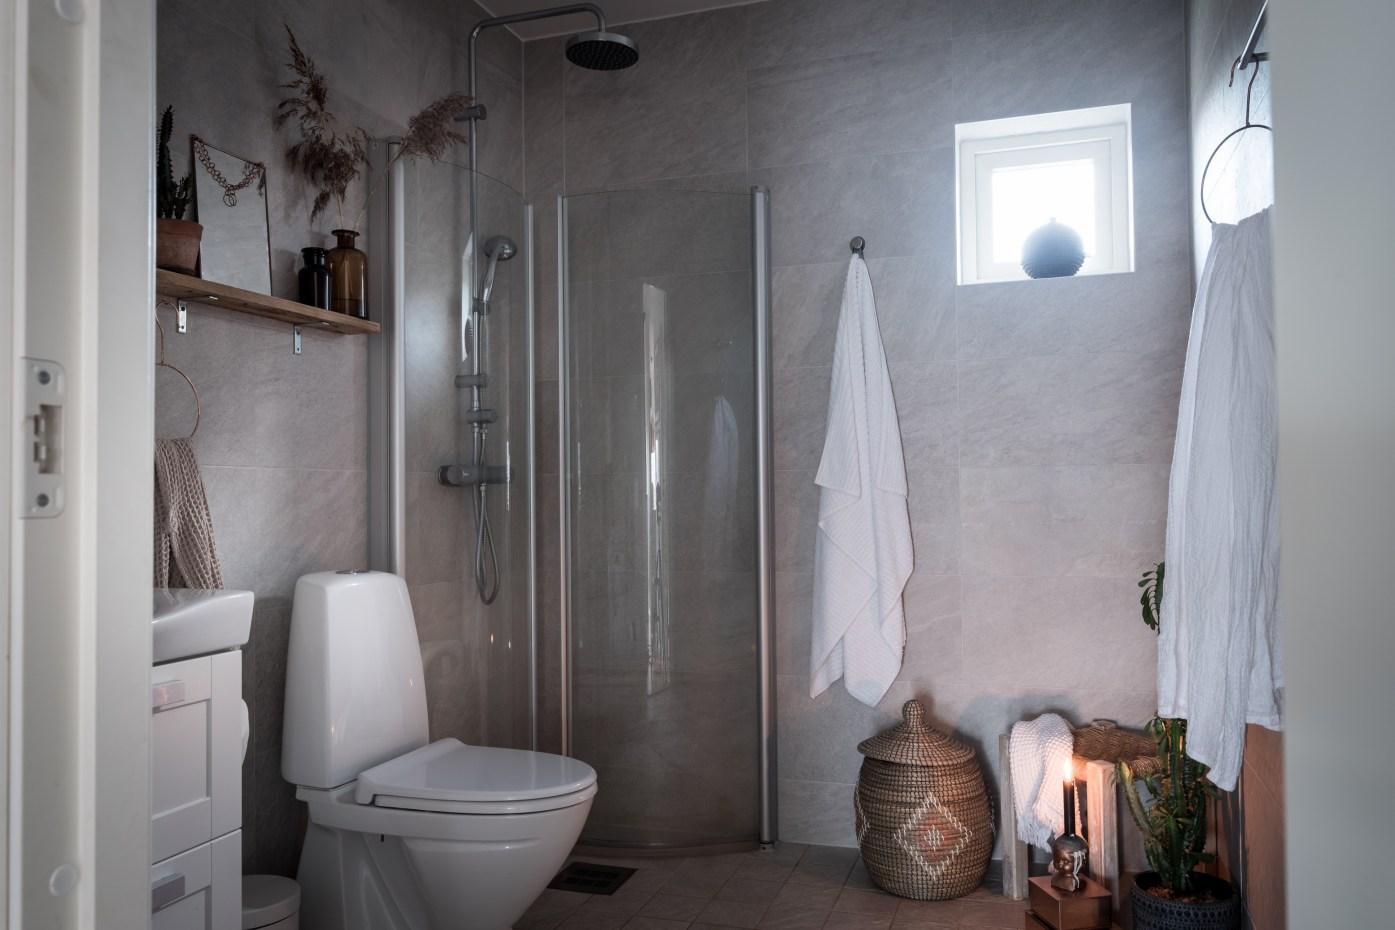 дом-150-квм-санузел-душевая